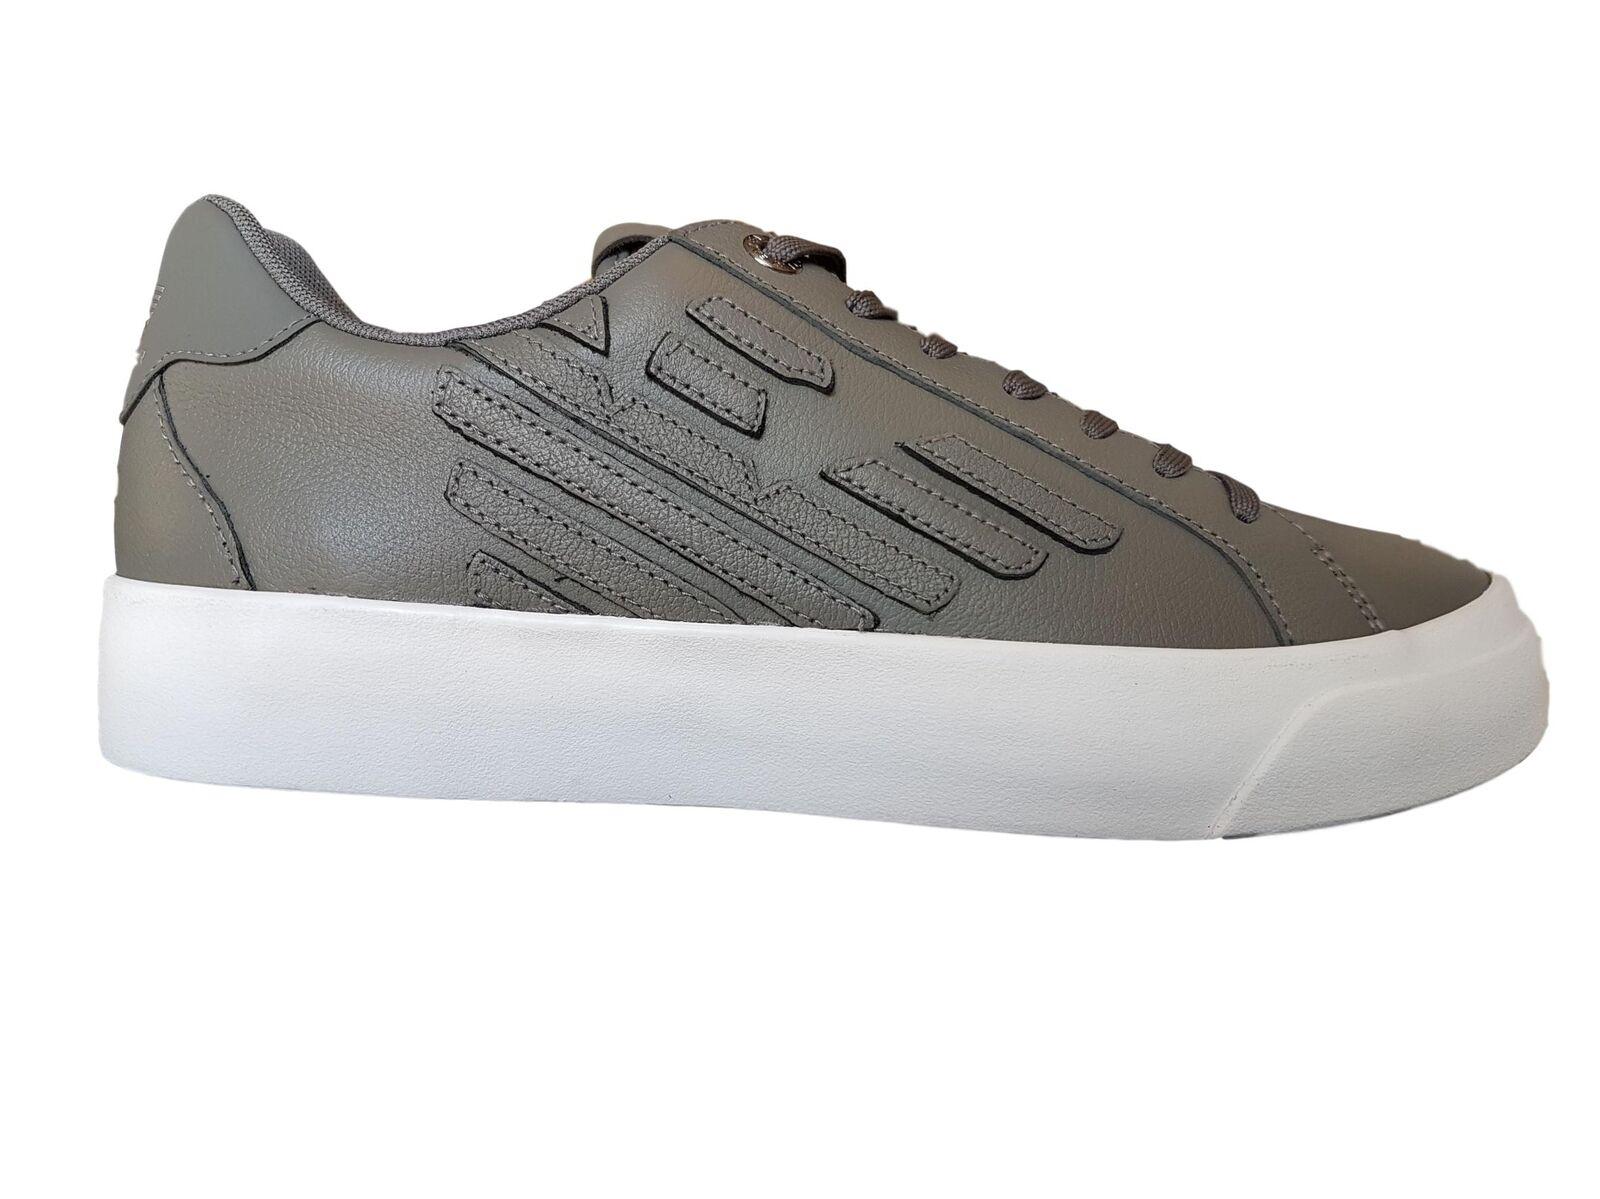 shoes EA7 Emporio Armani 7 EA men X8X004 Sneakers Basse grey Pelle Sport